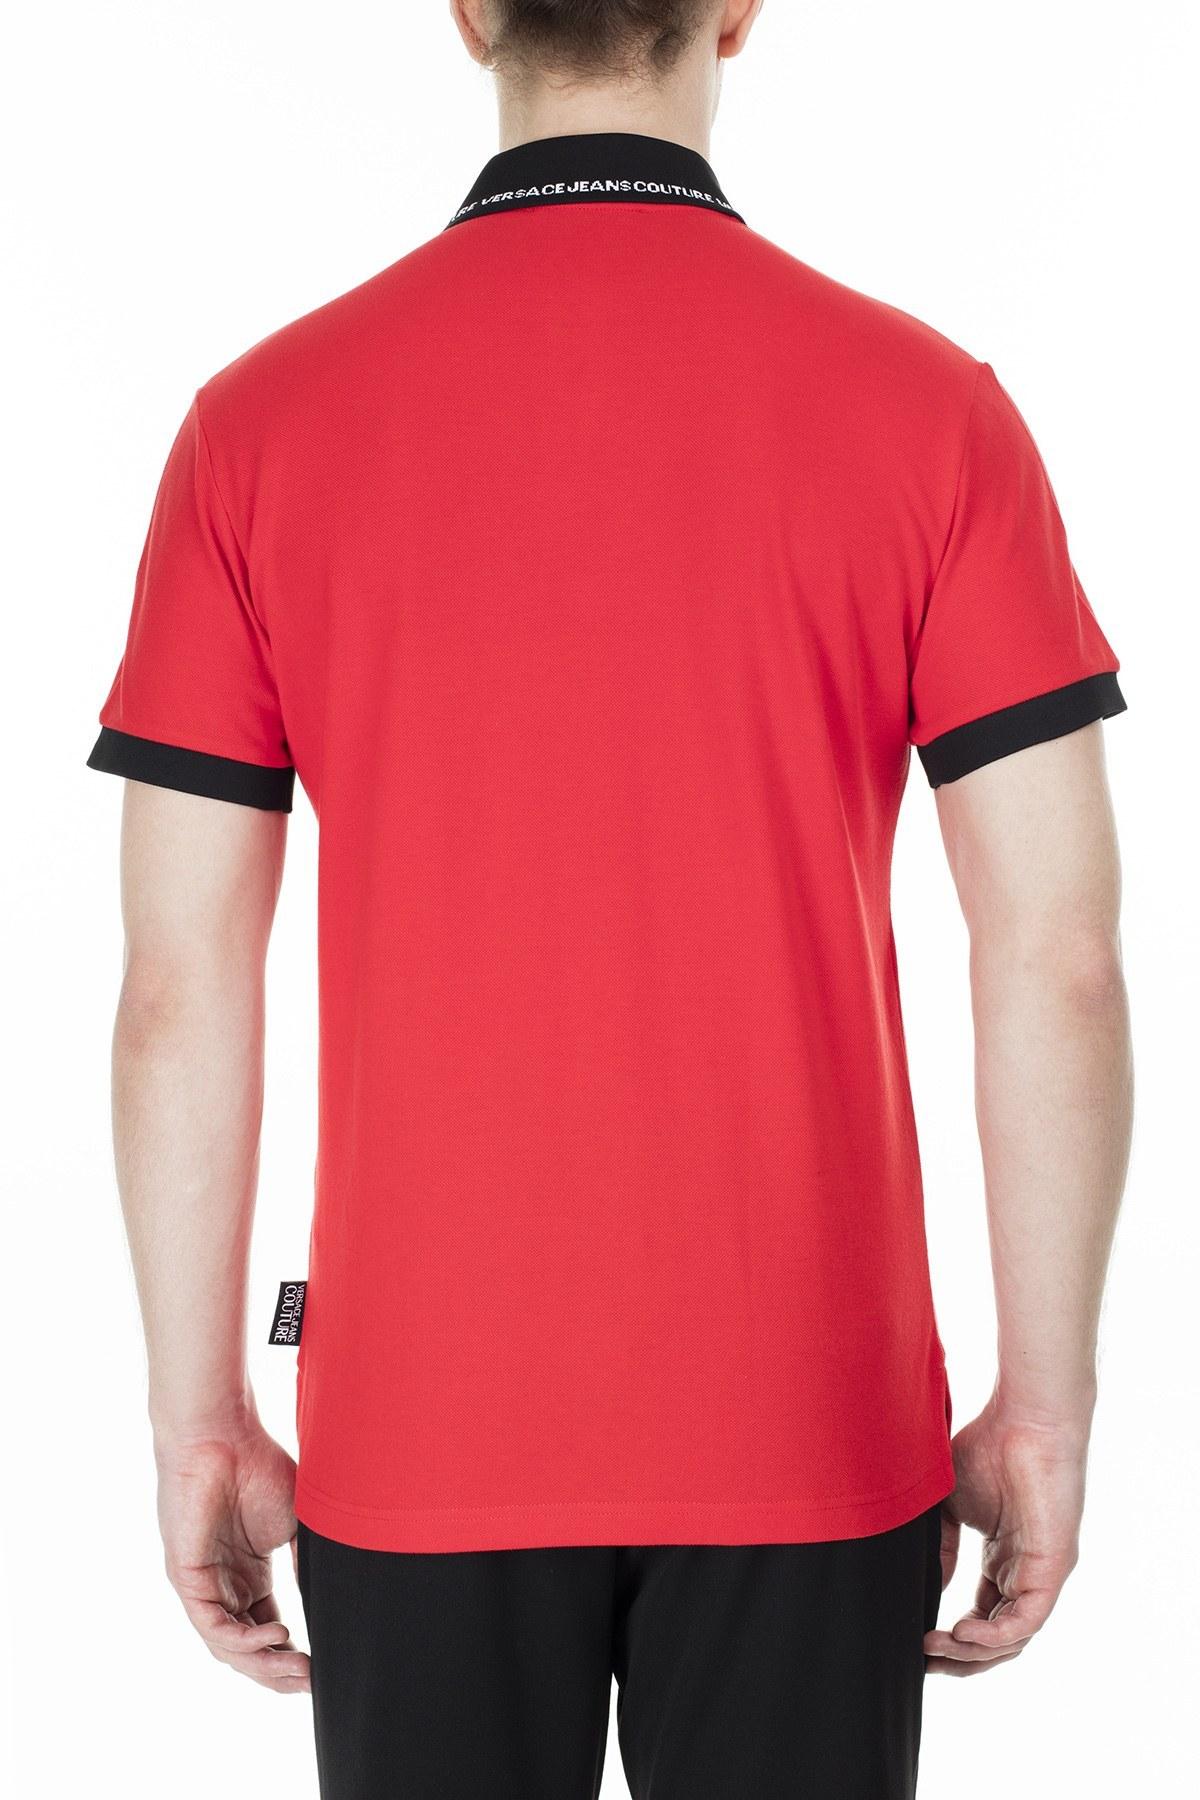 Versace Jeans Couture Regular Fit T Shirt Erkek Polo B3GVB7P5 36571 537 KIRMIZI